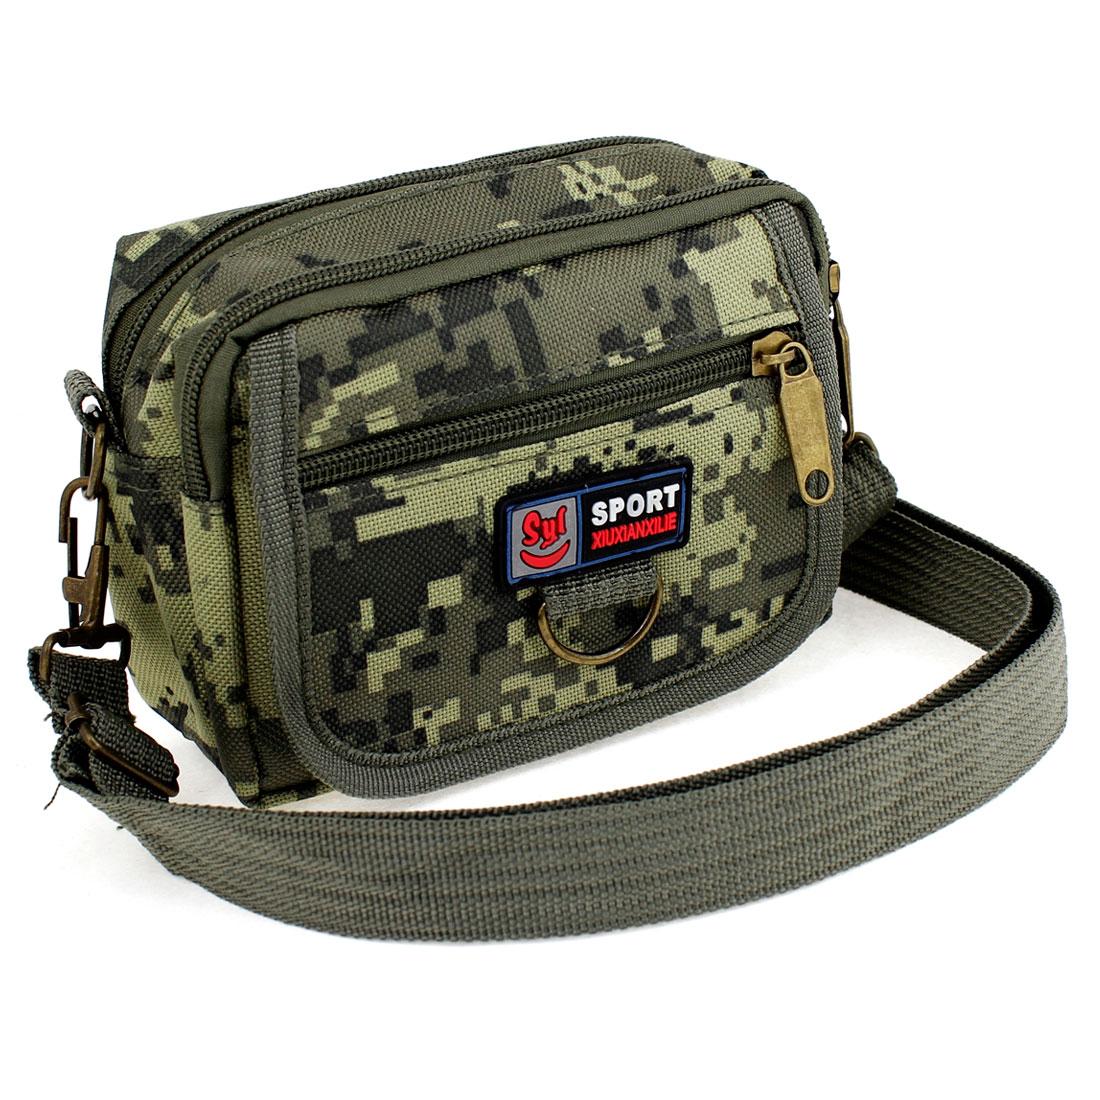 Men Belt Loop Design Army Green Camouflage Print Waist Pack w Adjustable Strap